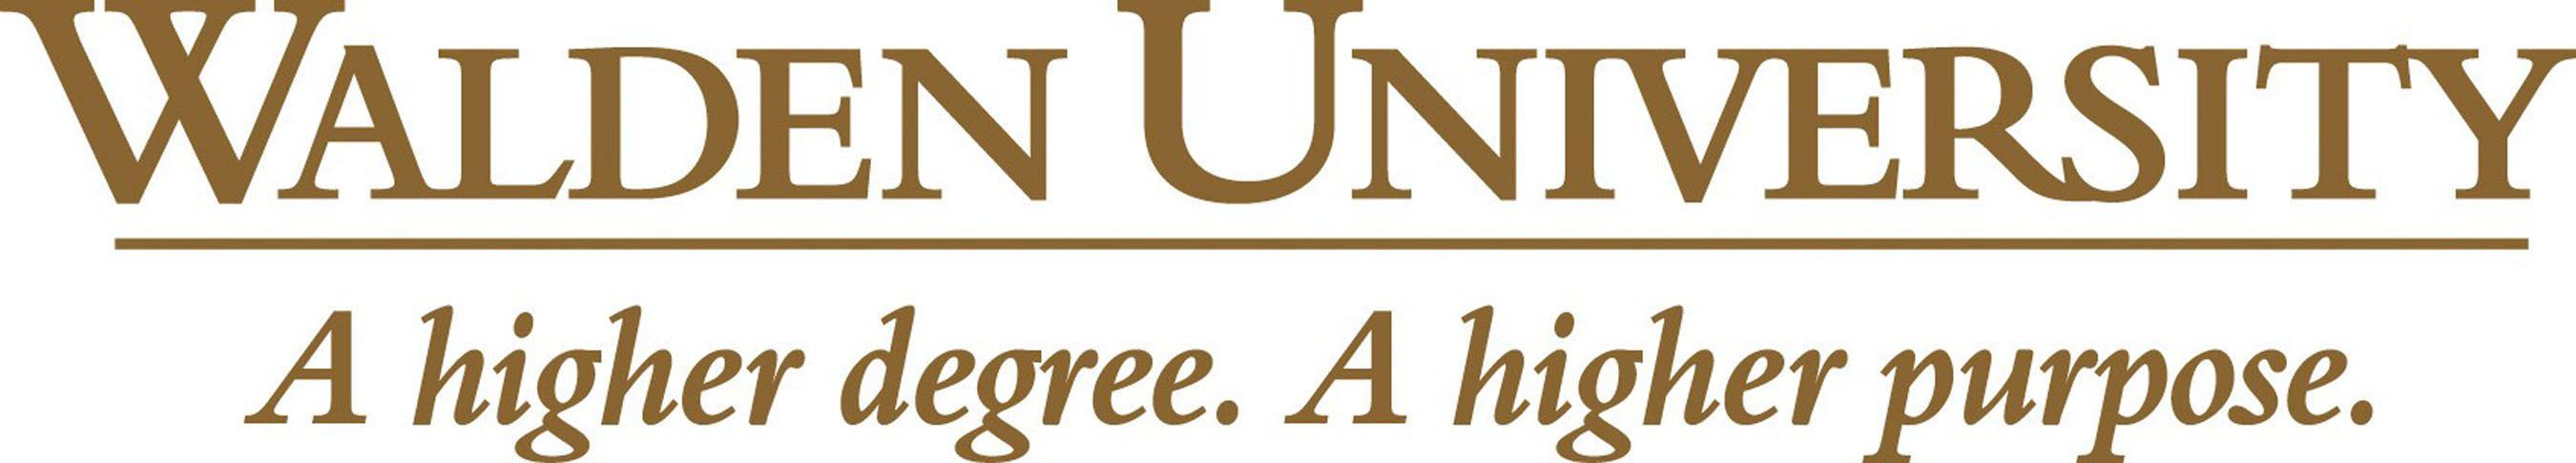 Walden University logo. (PRNewsFoto/Walden University) (PRNewsFoto/)